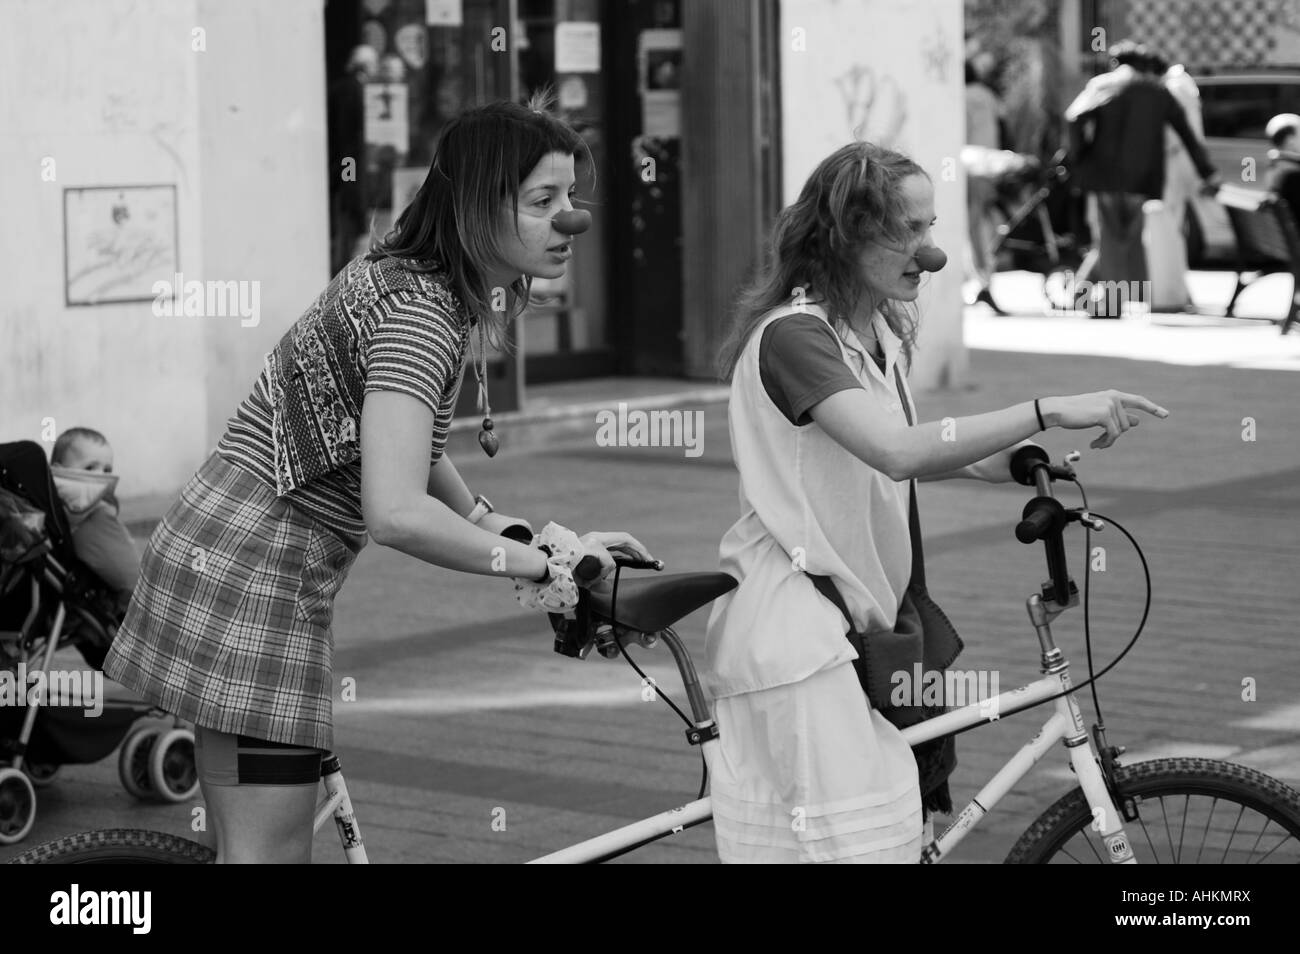 Female clowns in a street contemporary dance & theater festival.  Spain Square, Zaragoza, Aragón, Spain. - Stock Image